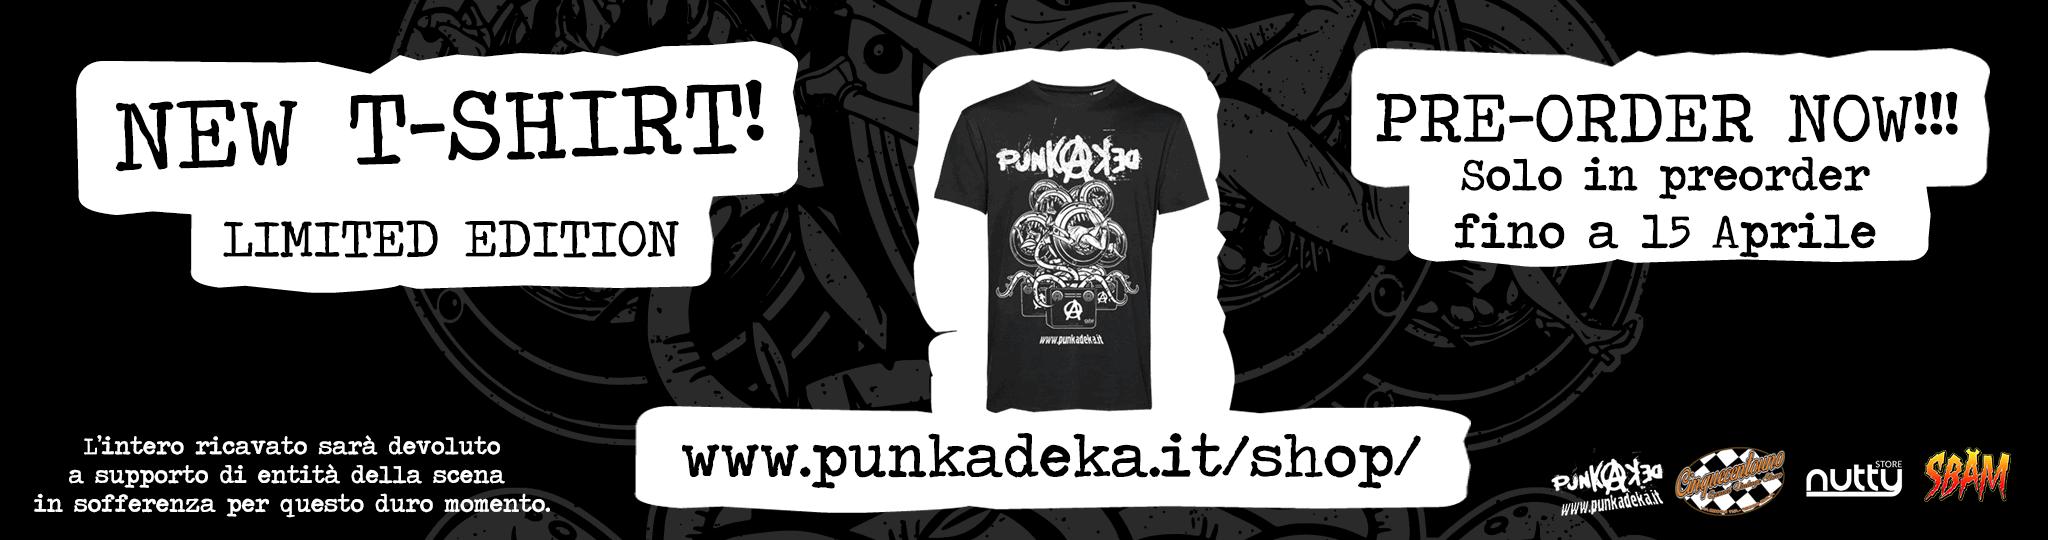 Punkadeka.it T-SHIRT PRE-ORDER NOW